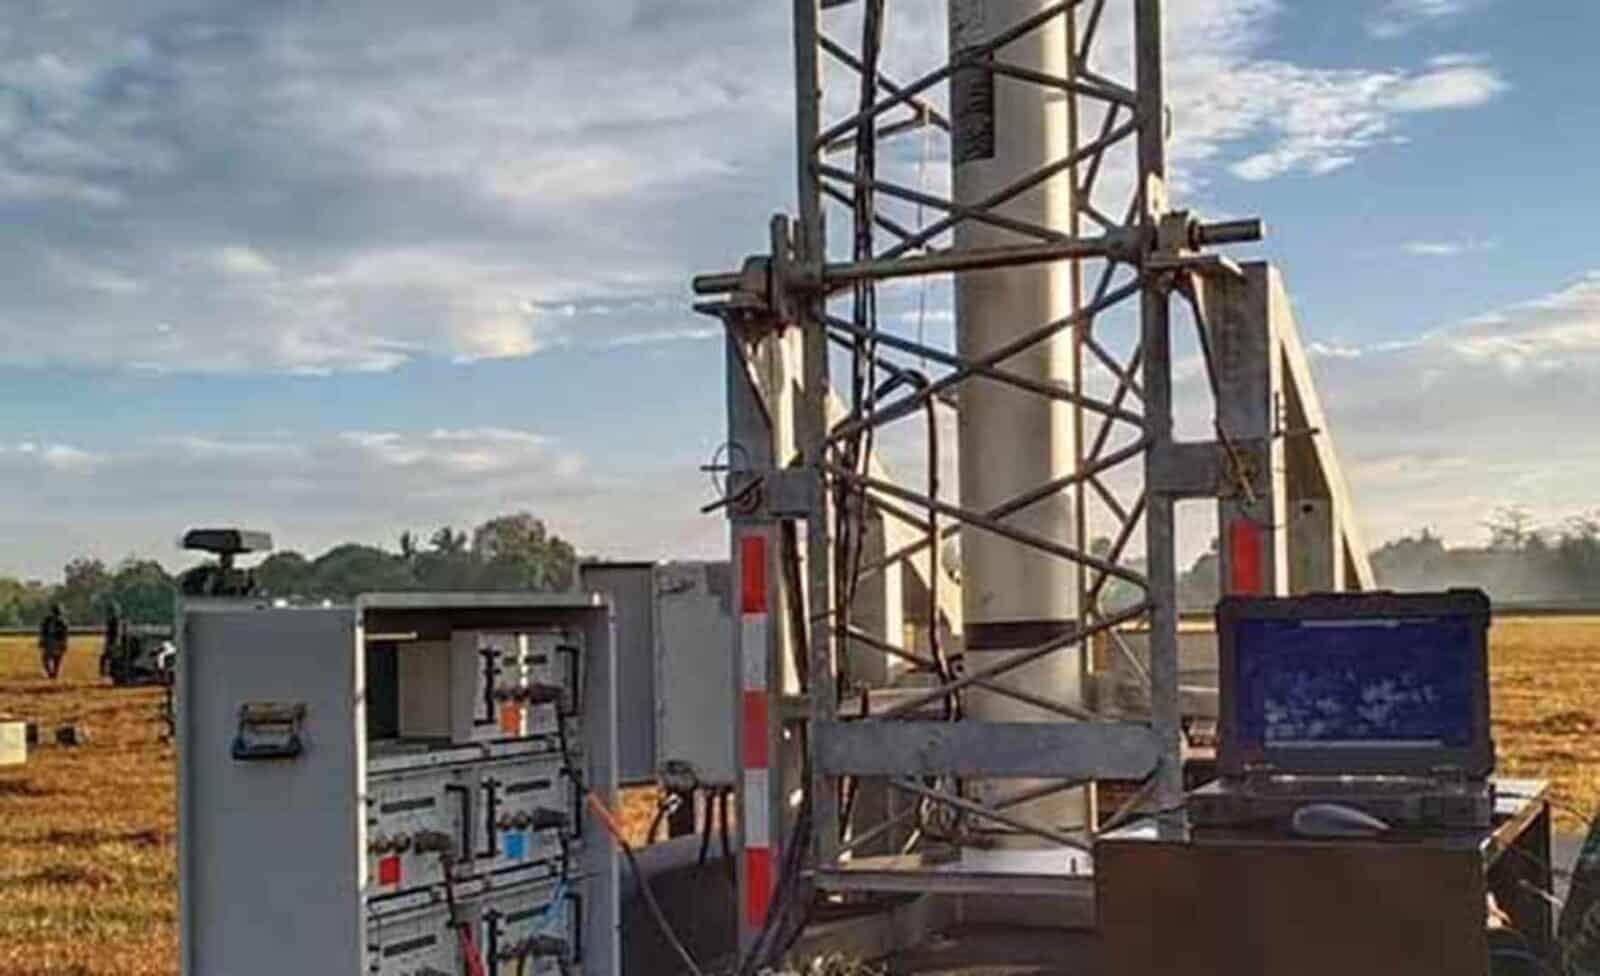 Oerlikon 472 Paskhas Deteksi Terintegrasi Radar Kohanudnas, Tersamar Smart Bomb Musuh